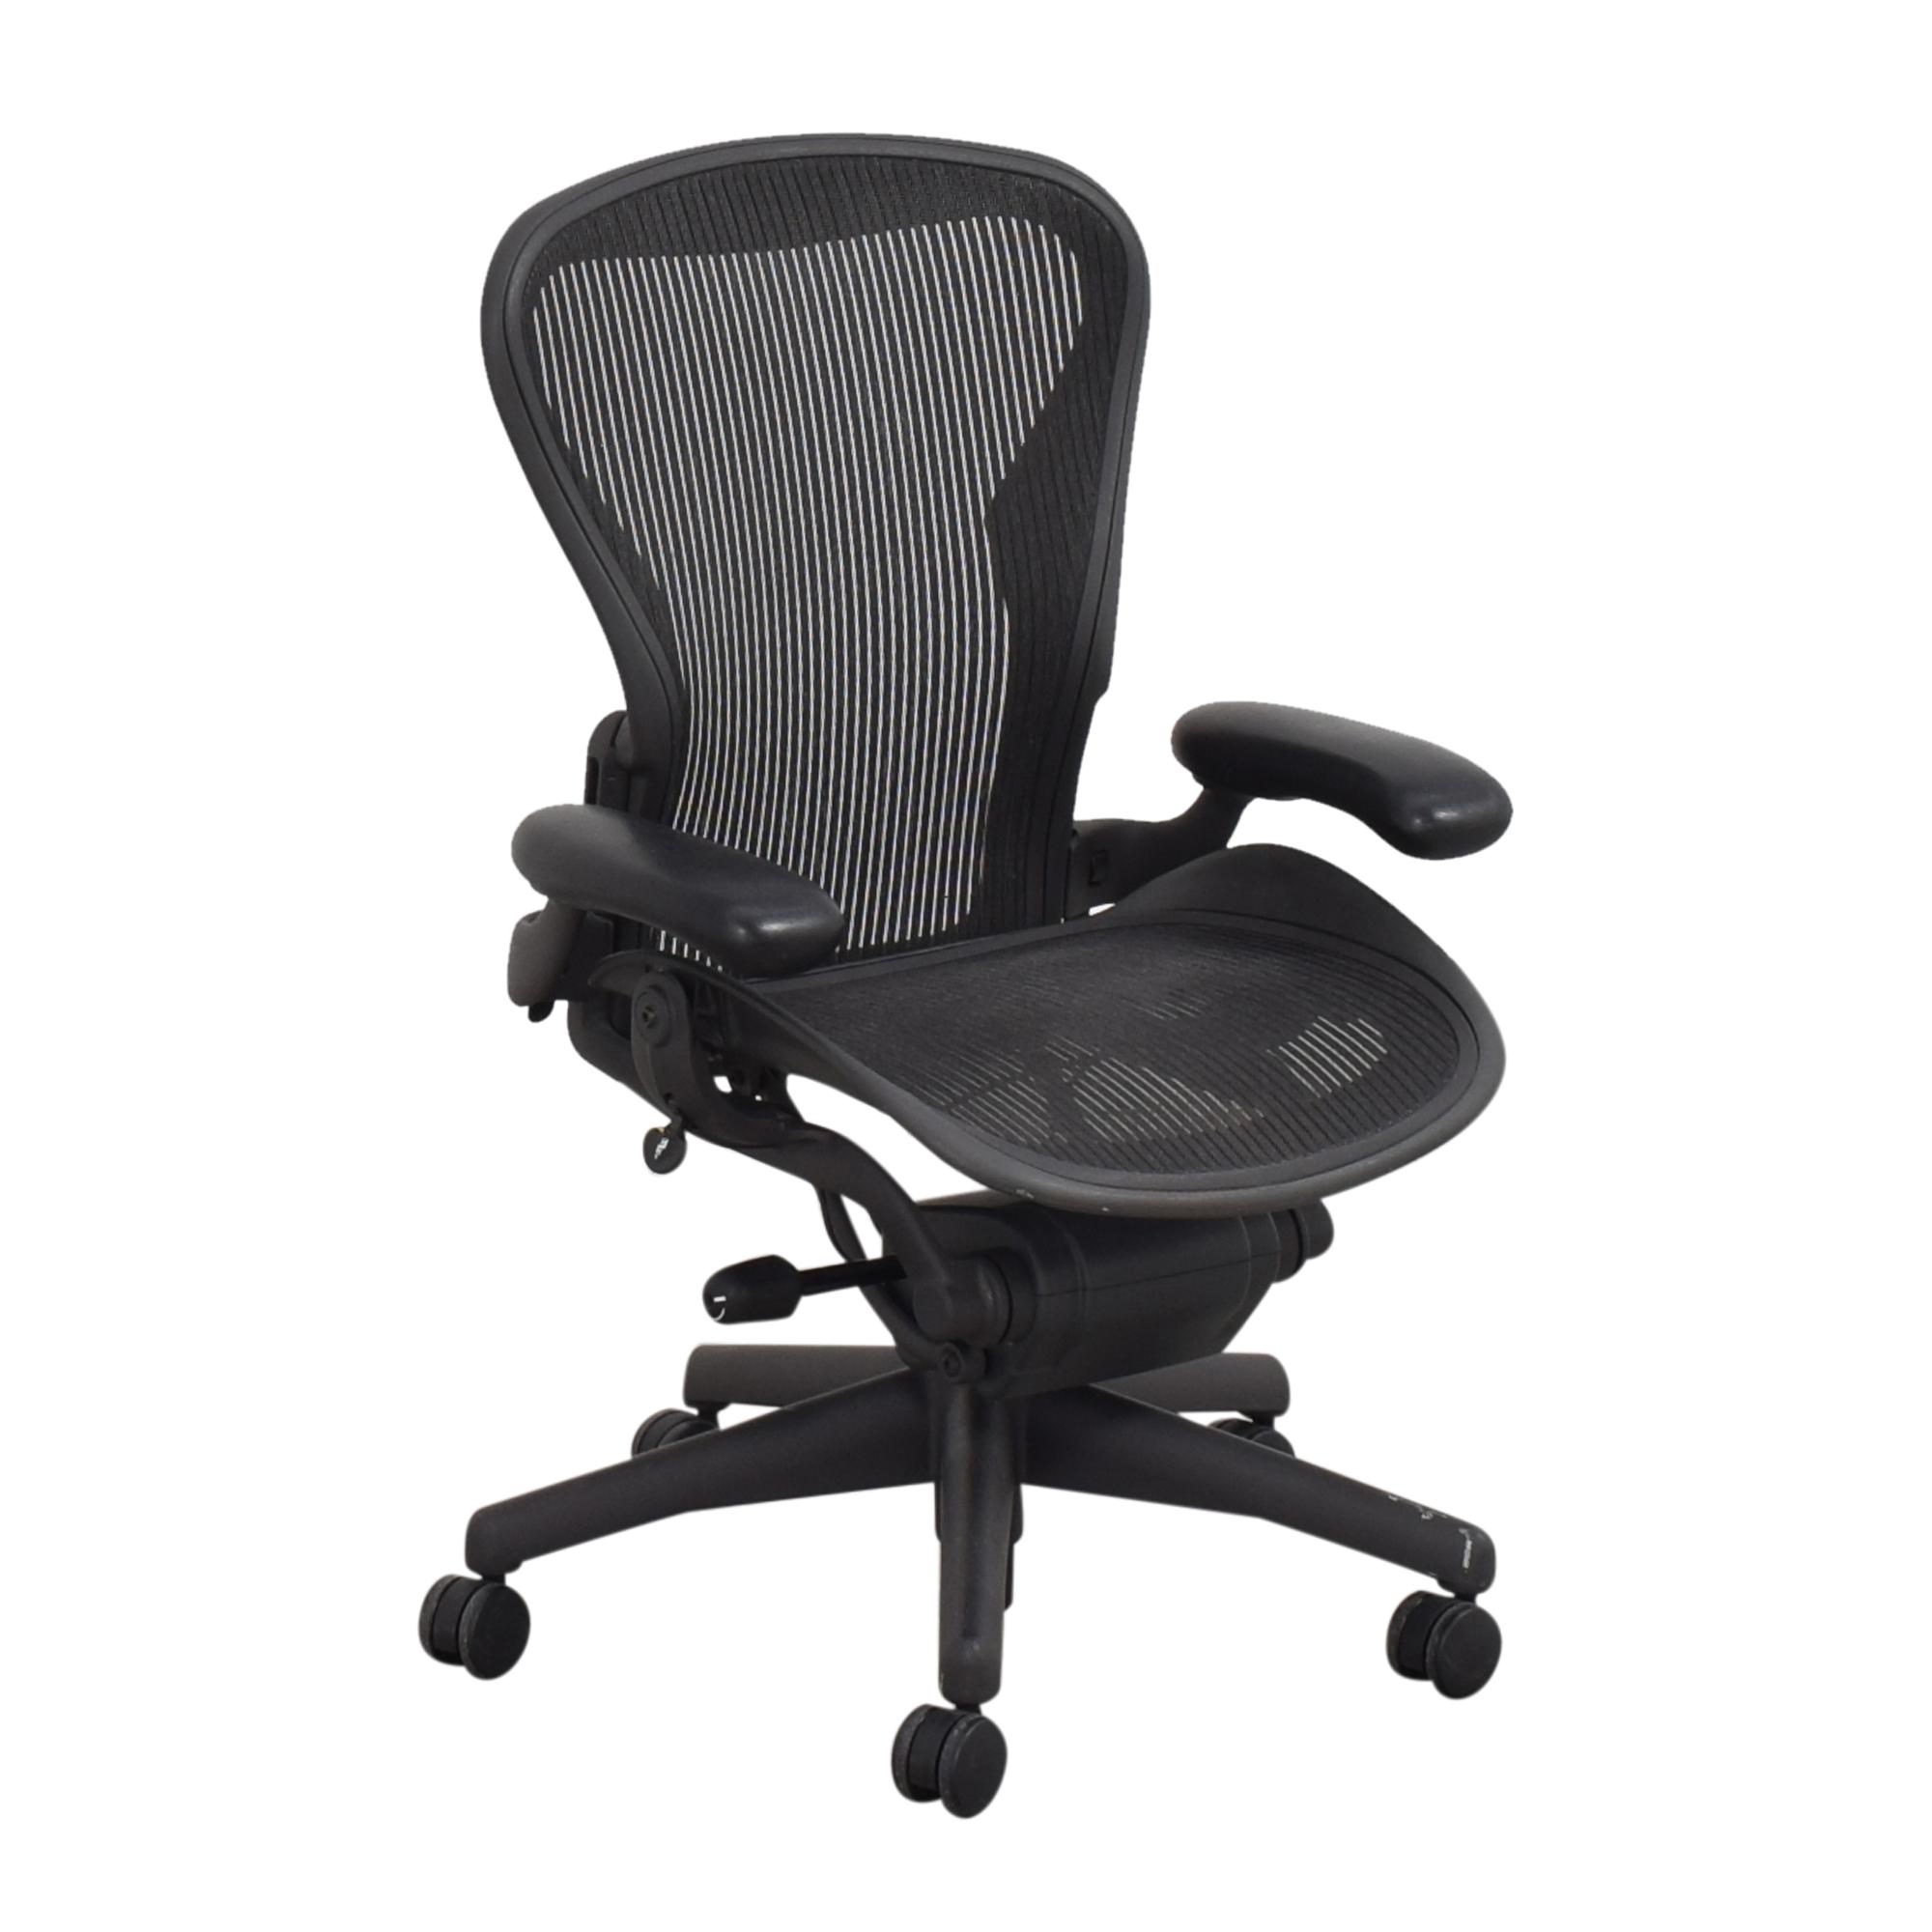 Herman Miller Size B Aeron Chair / Chairs